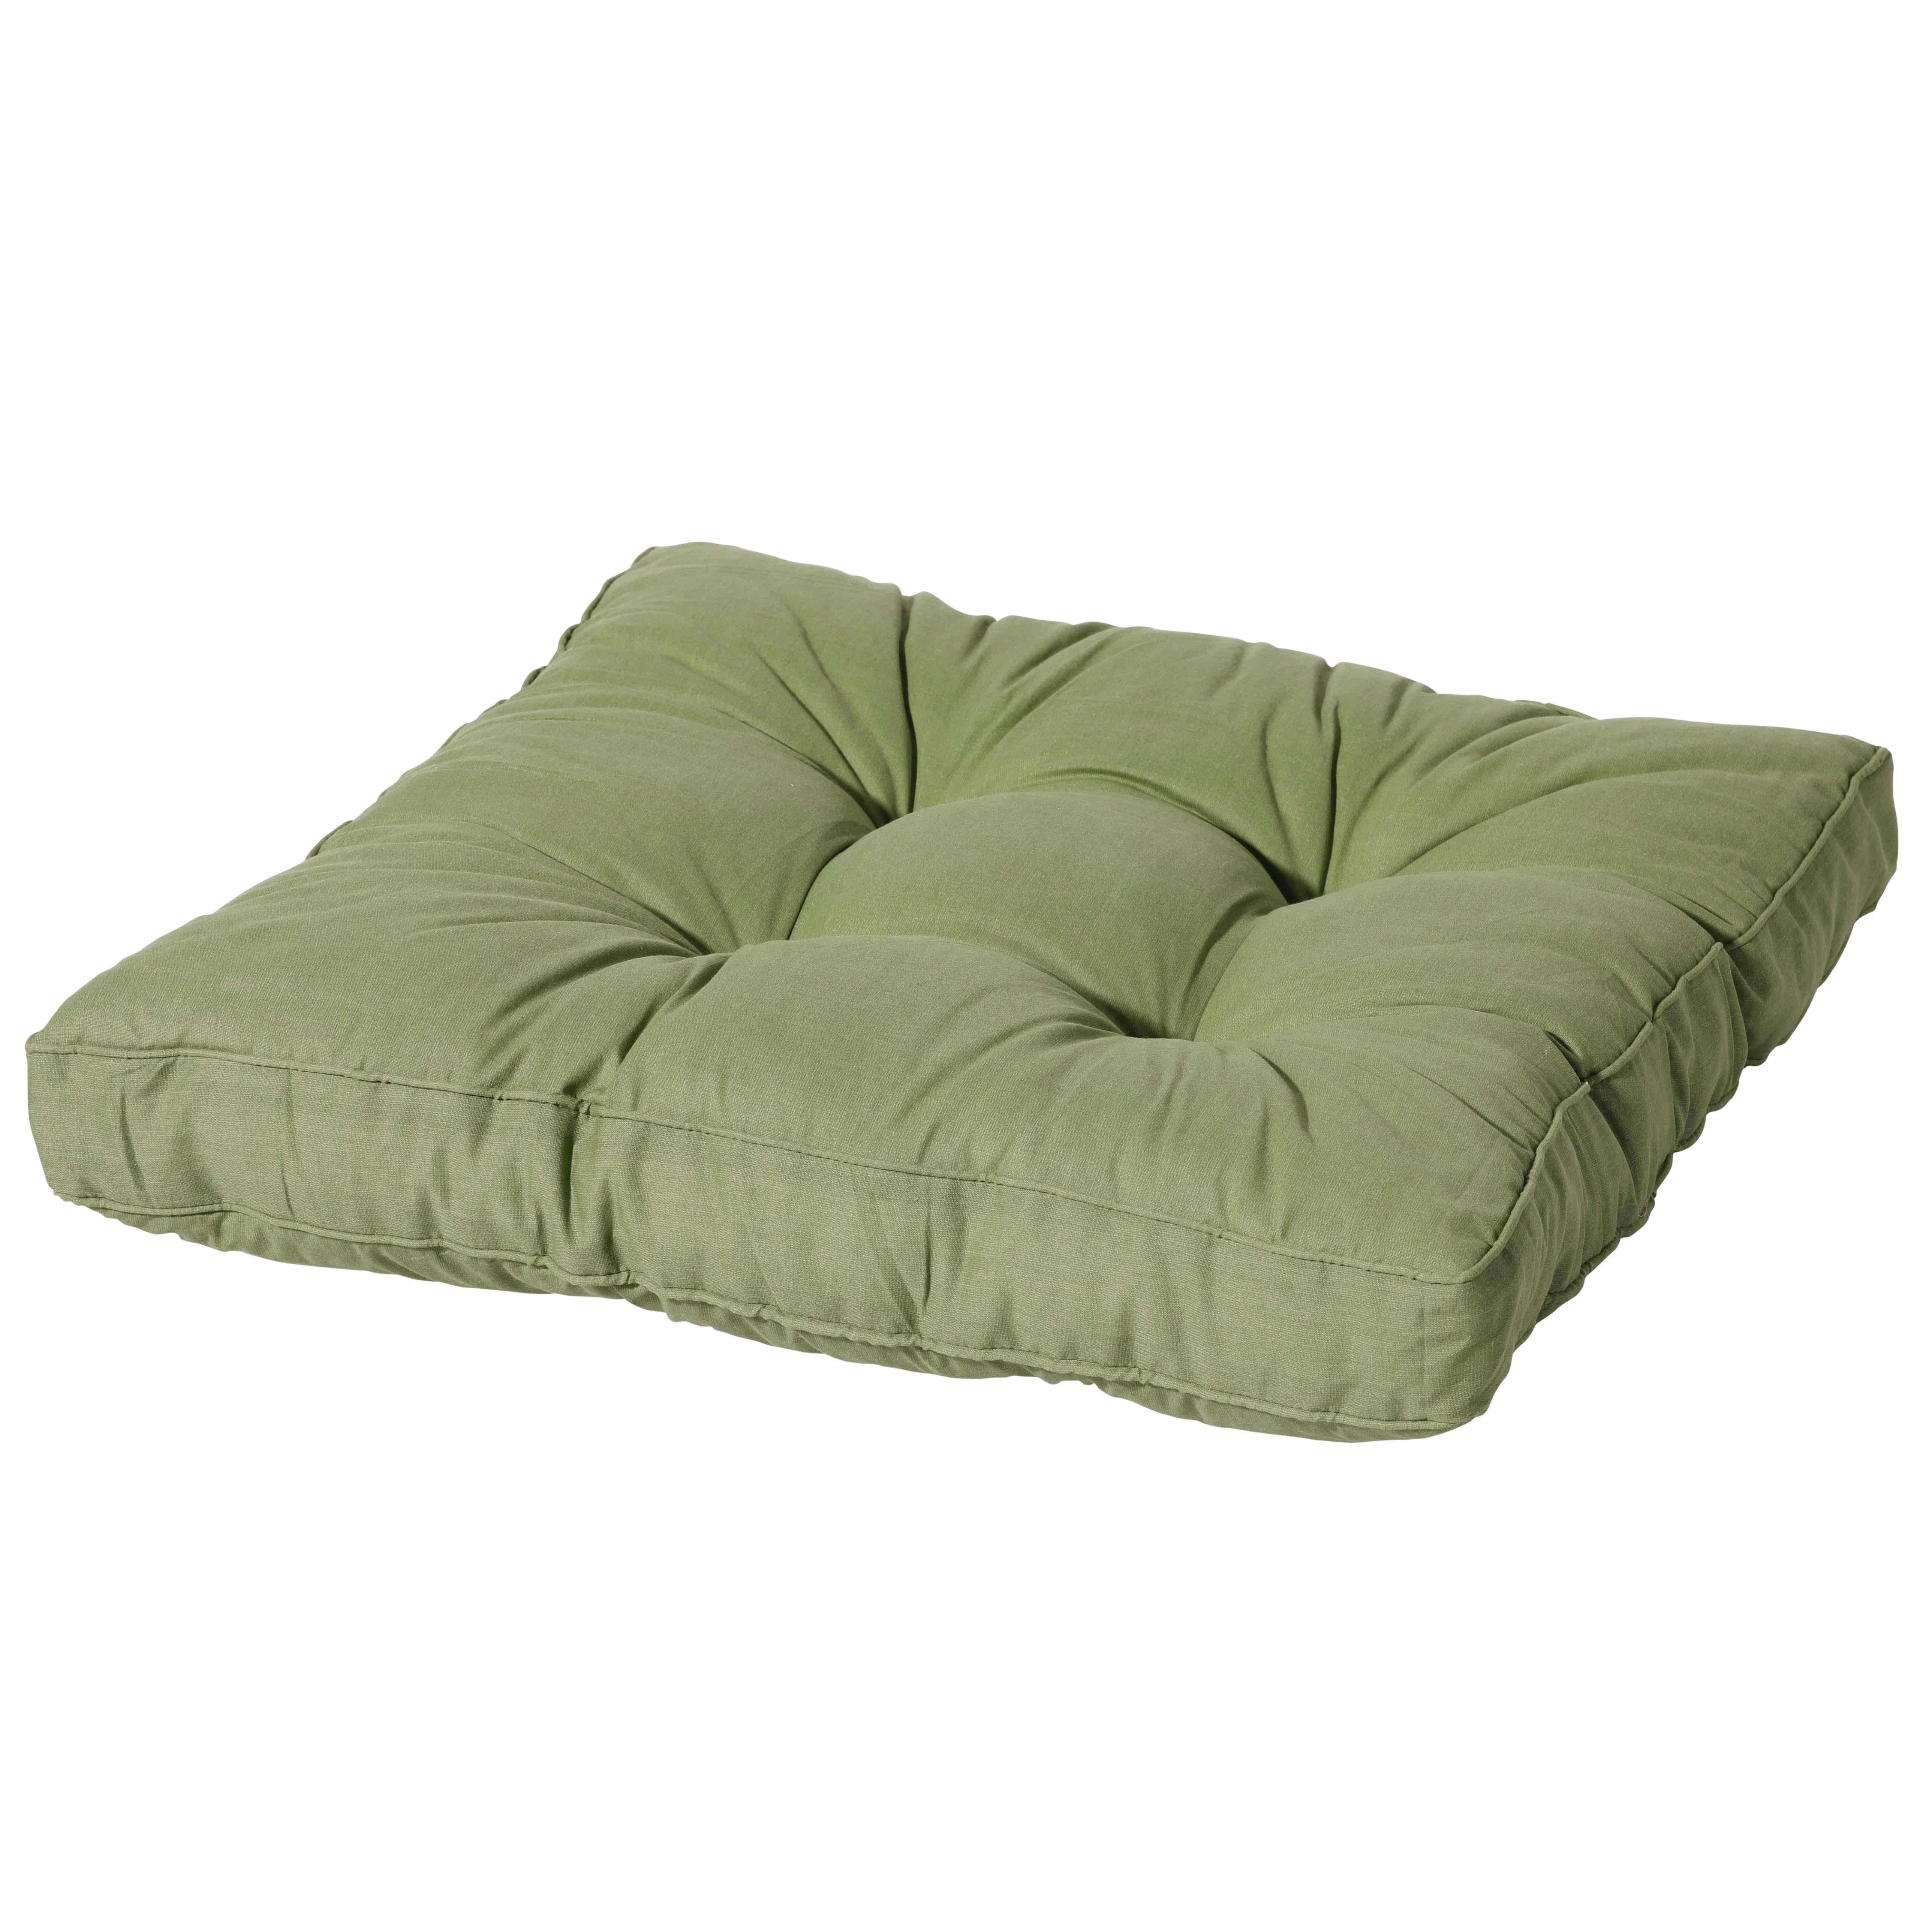 Loungekussen 60x60cm - Basic green